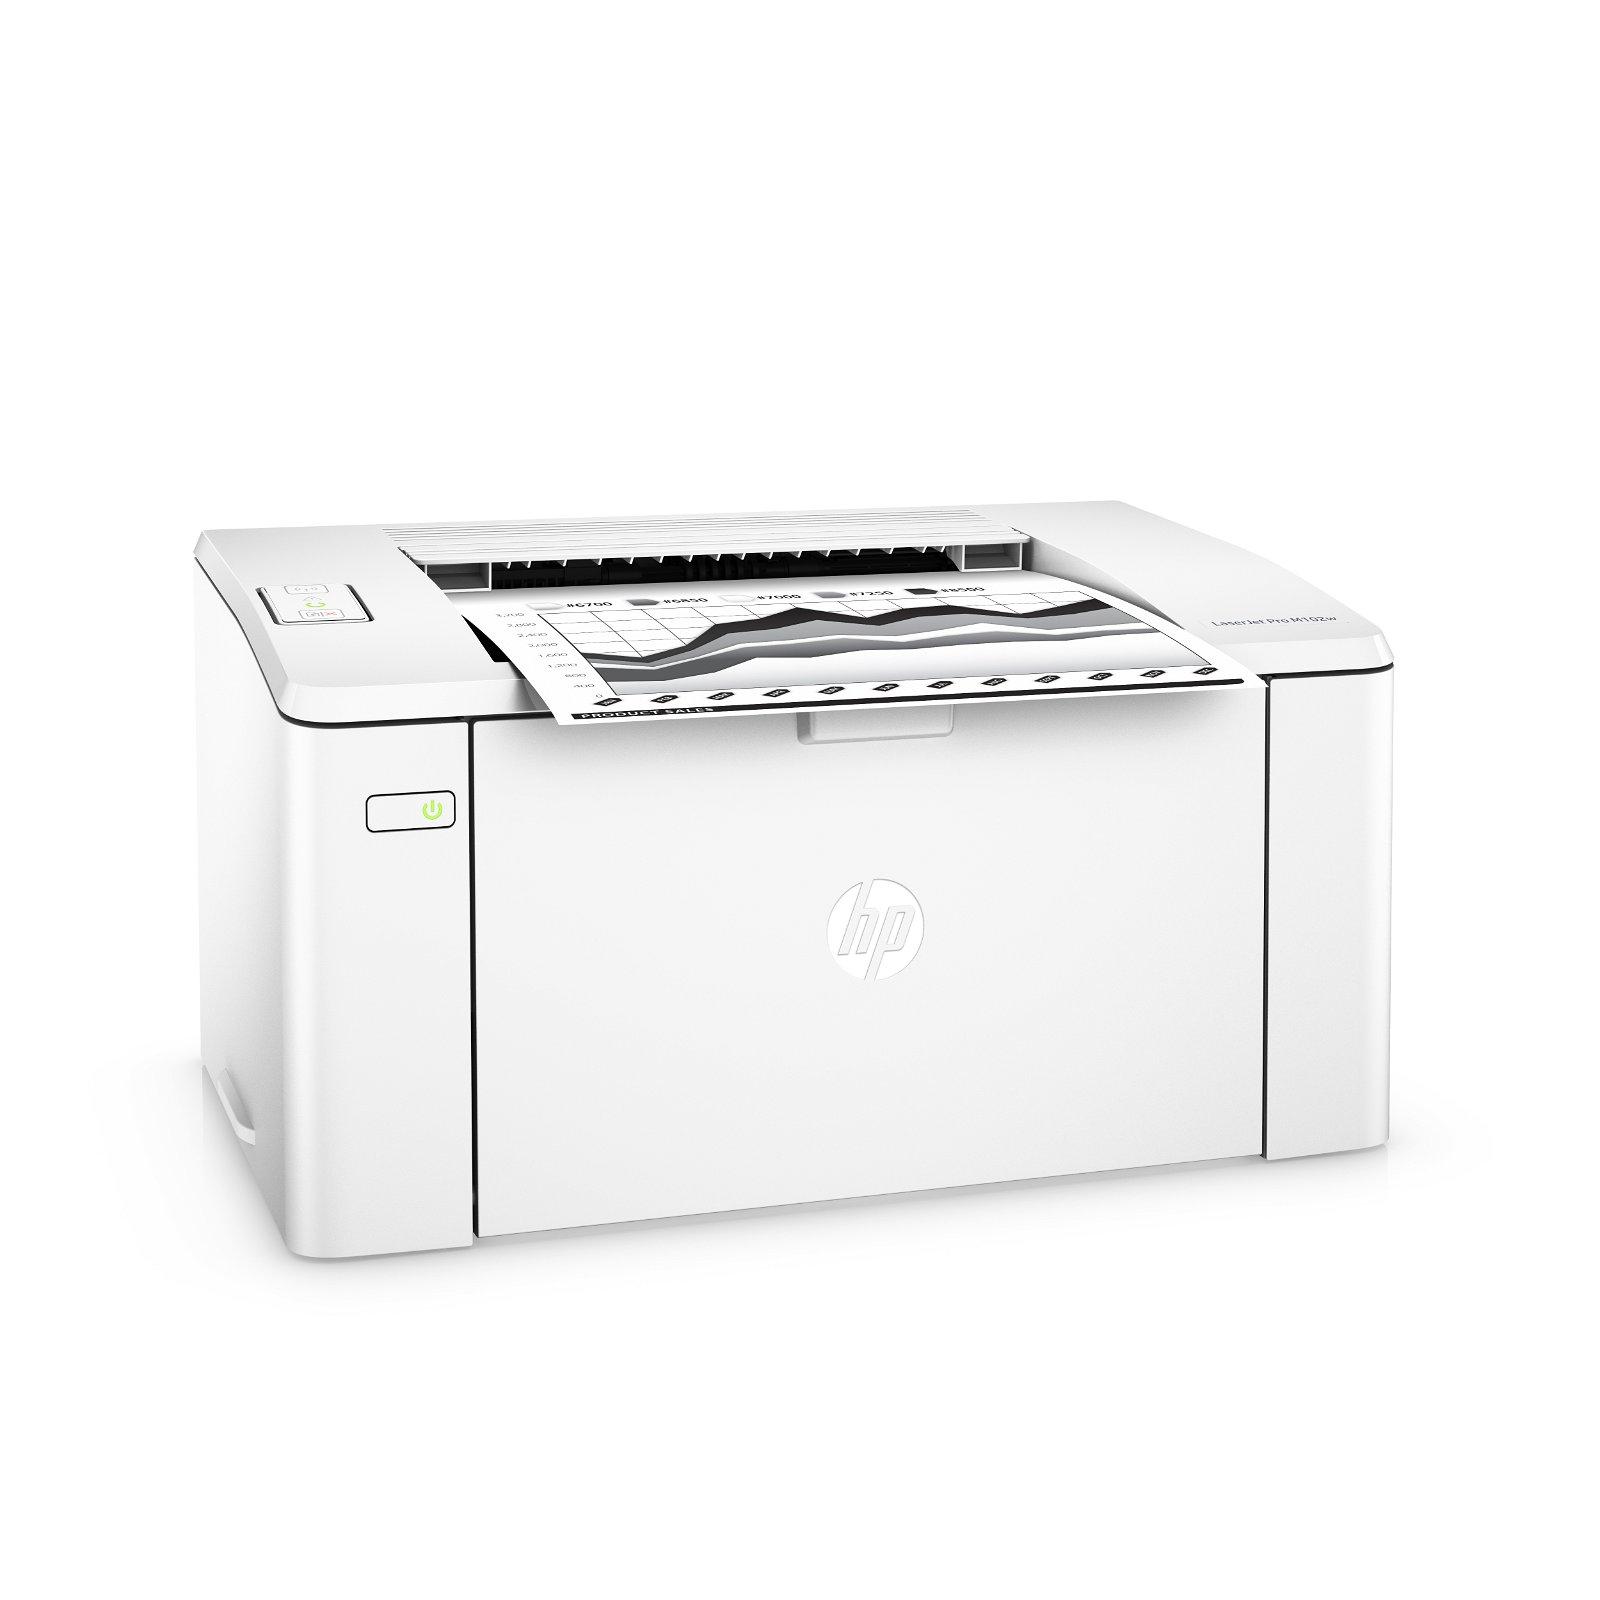 HP LaserJet Pro M102W laserprinter s/h, A4